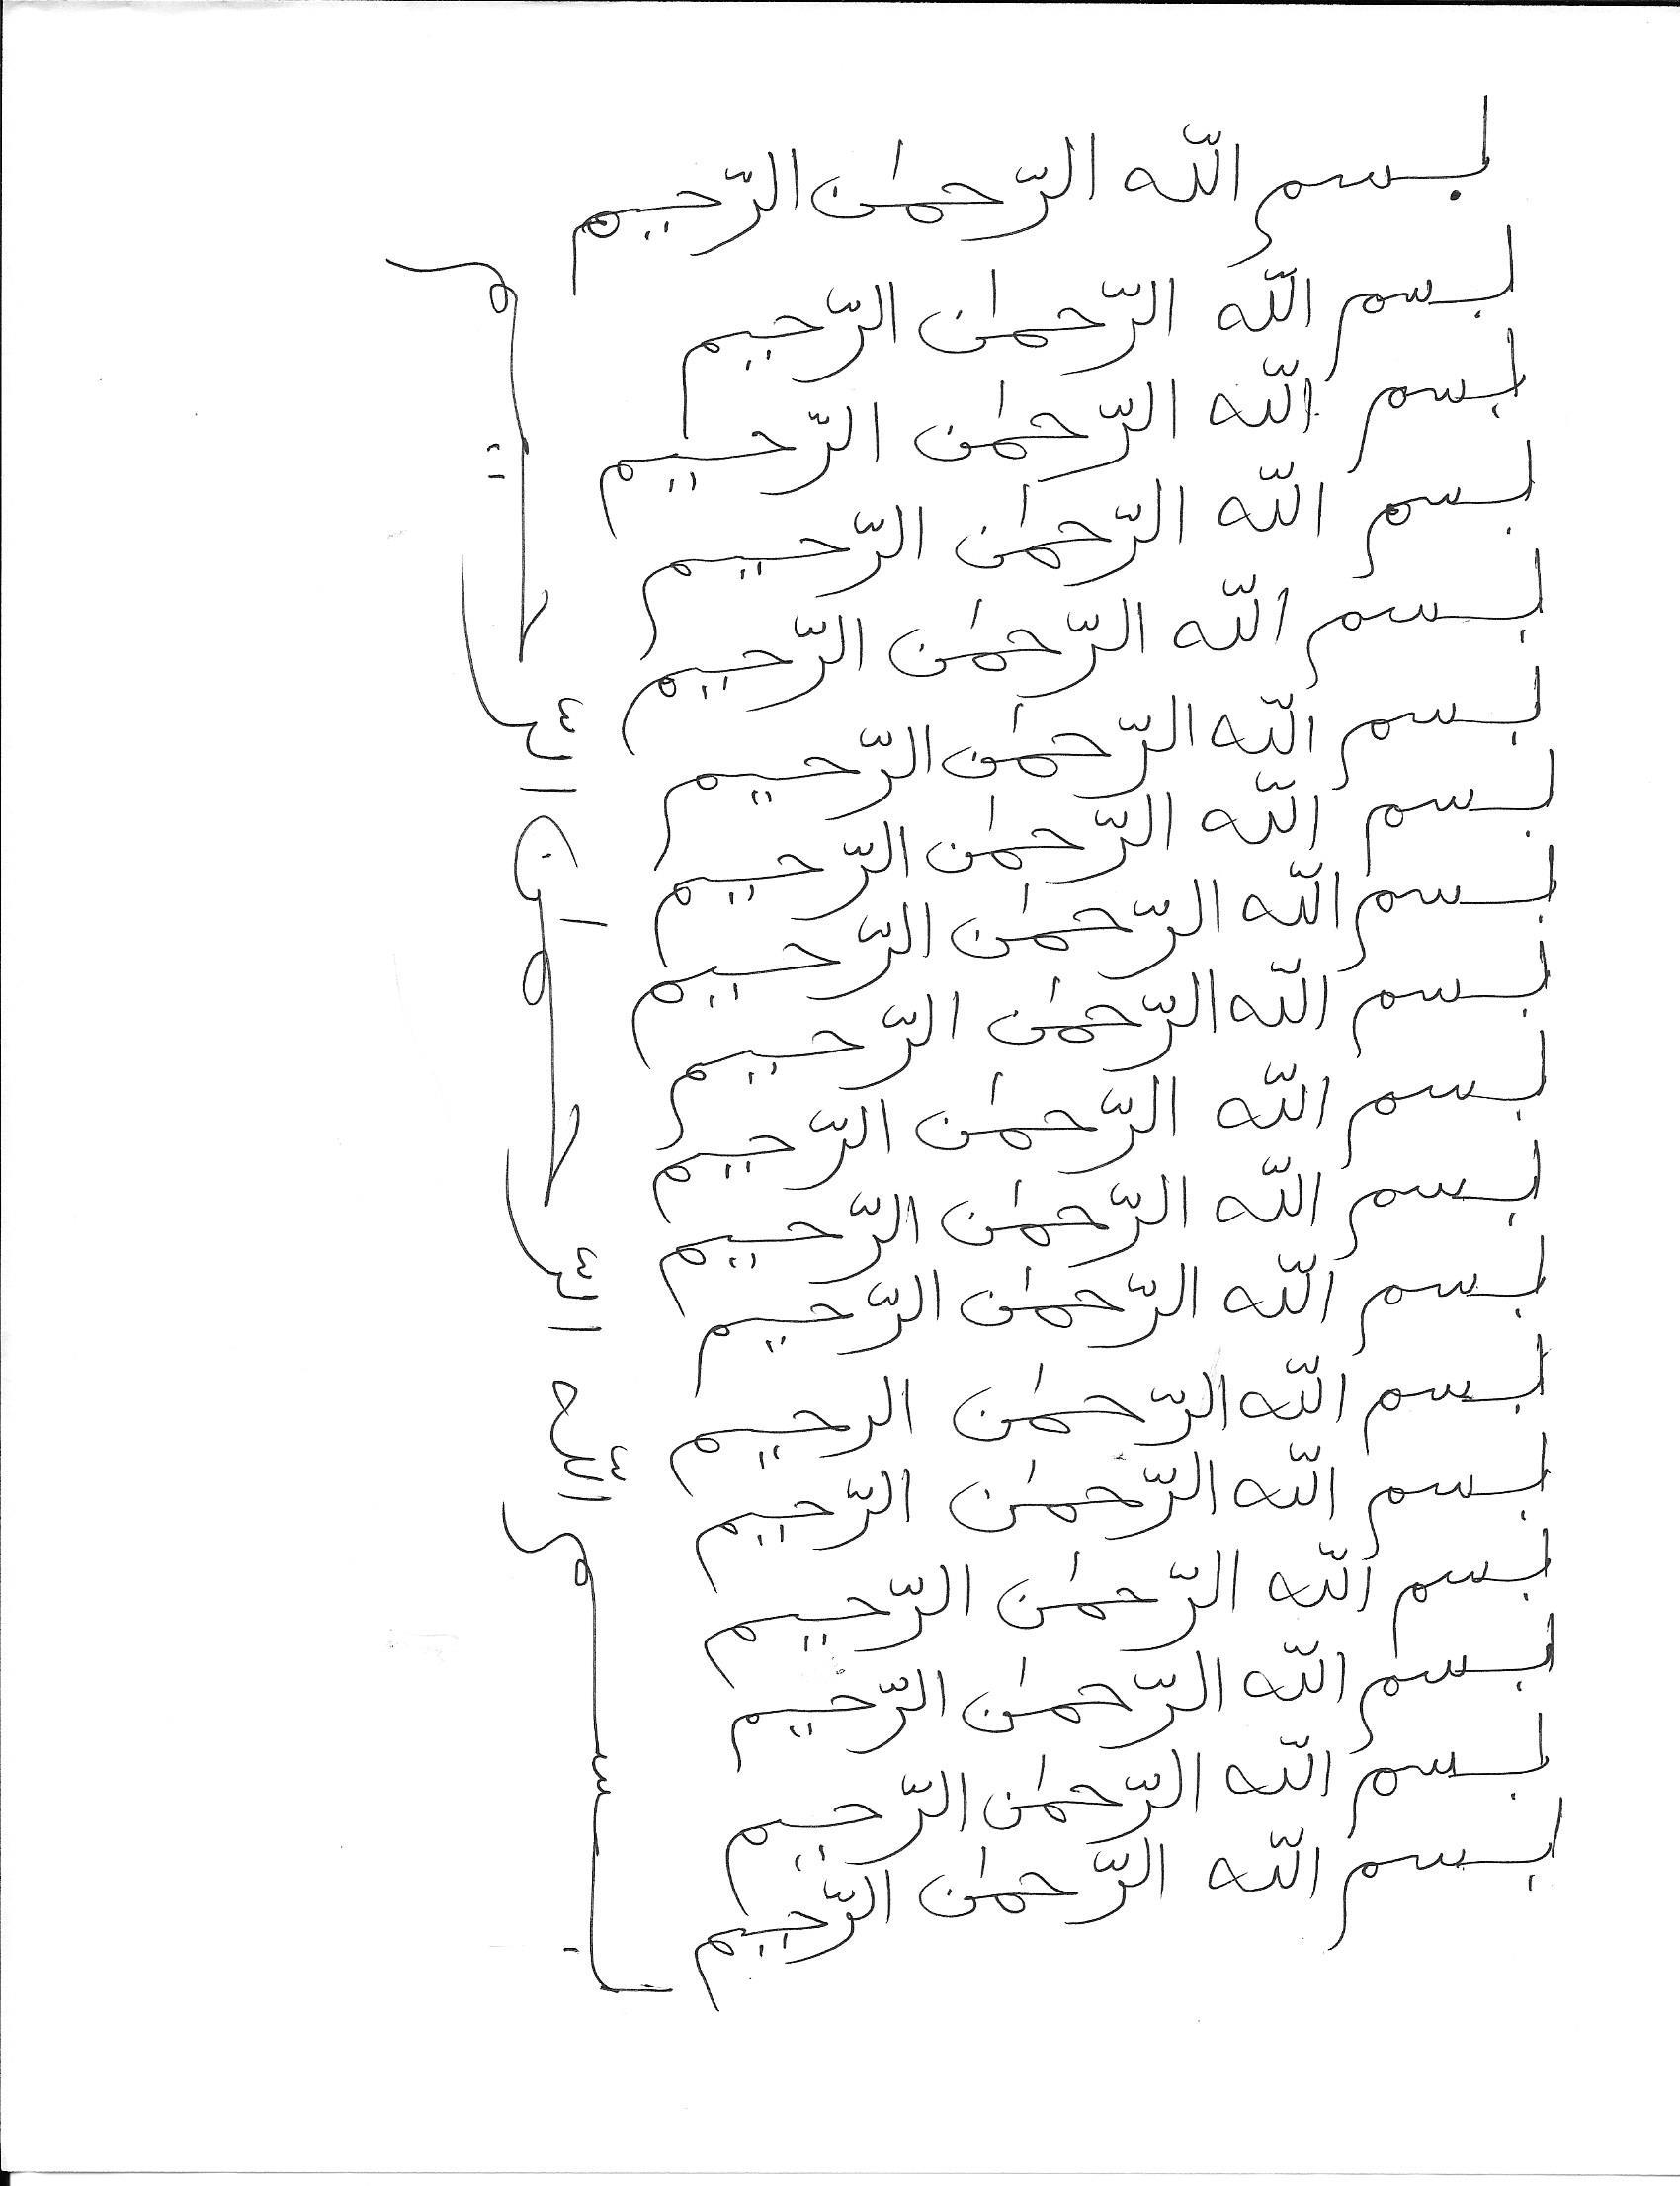 Probleme de memoire islam